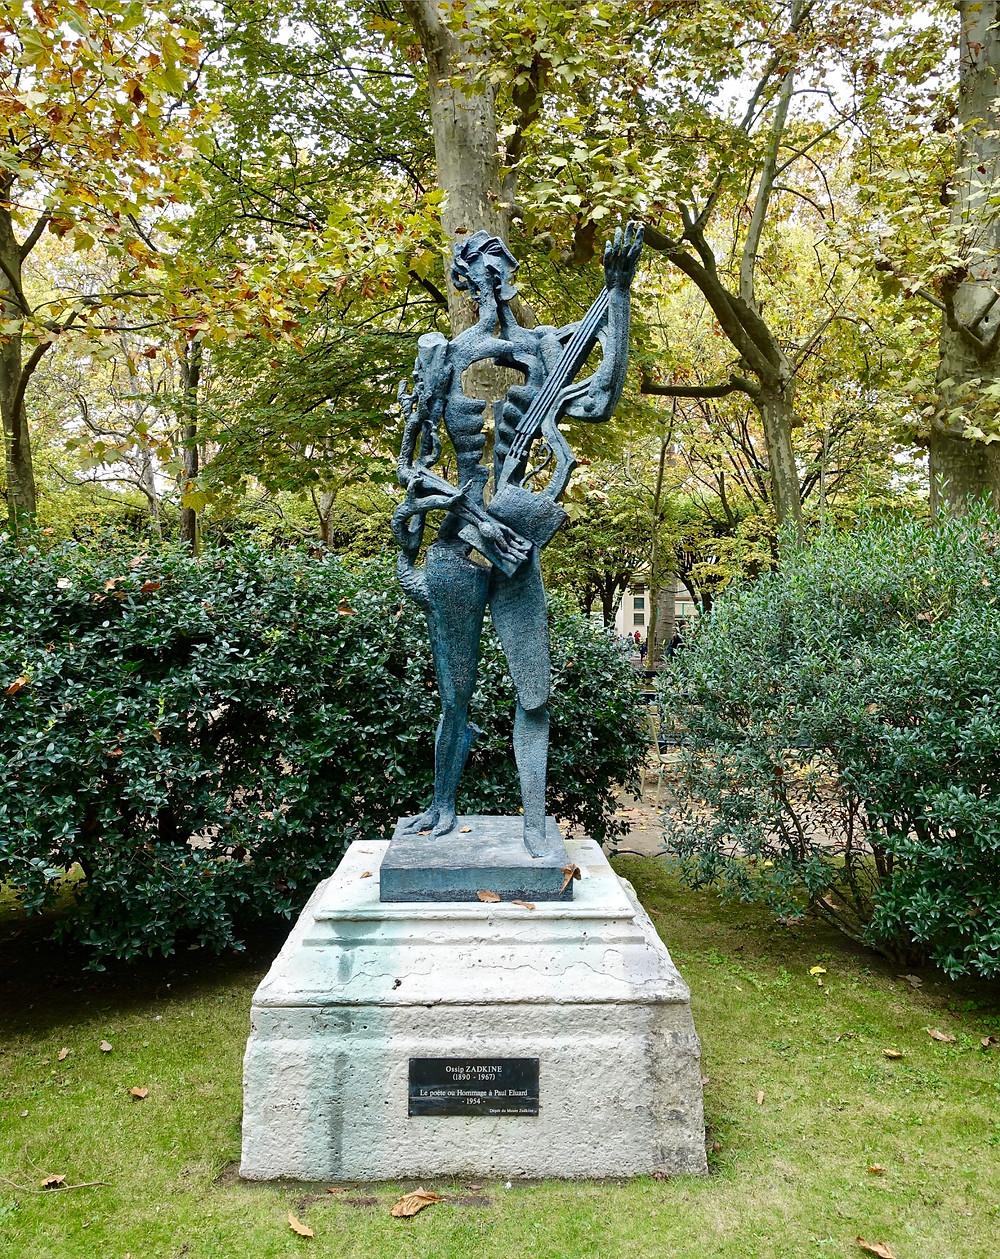 Homage to Paul Eluard by Ossip Zadkine